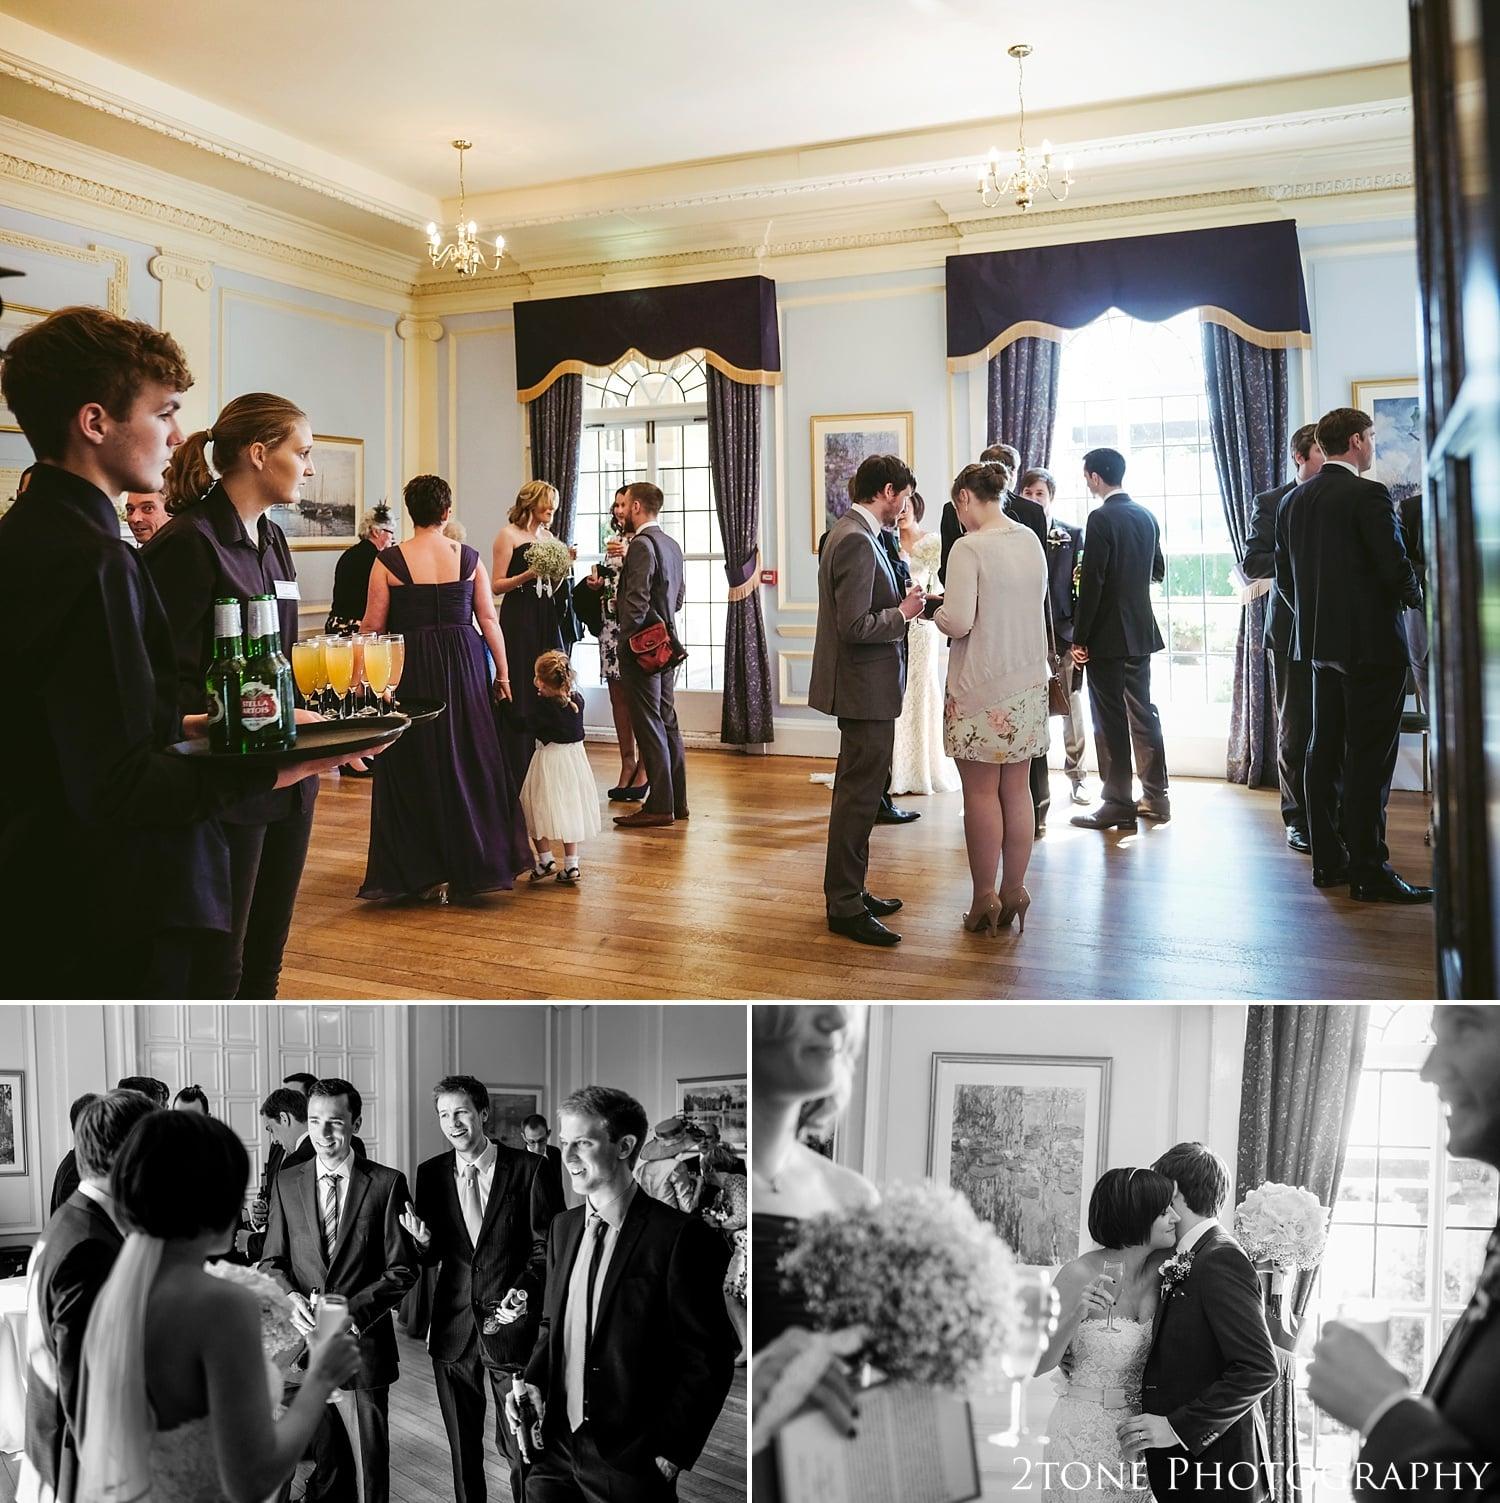 Wedding receptions at Kirkley Hall